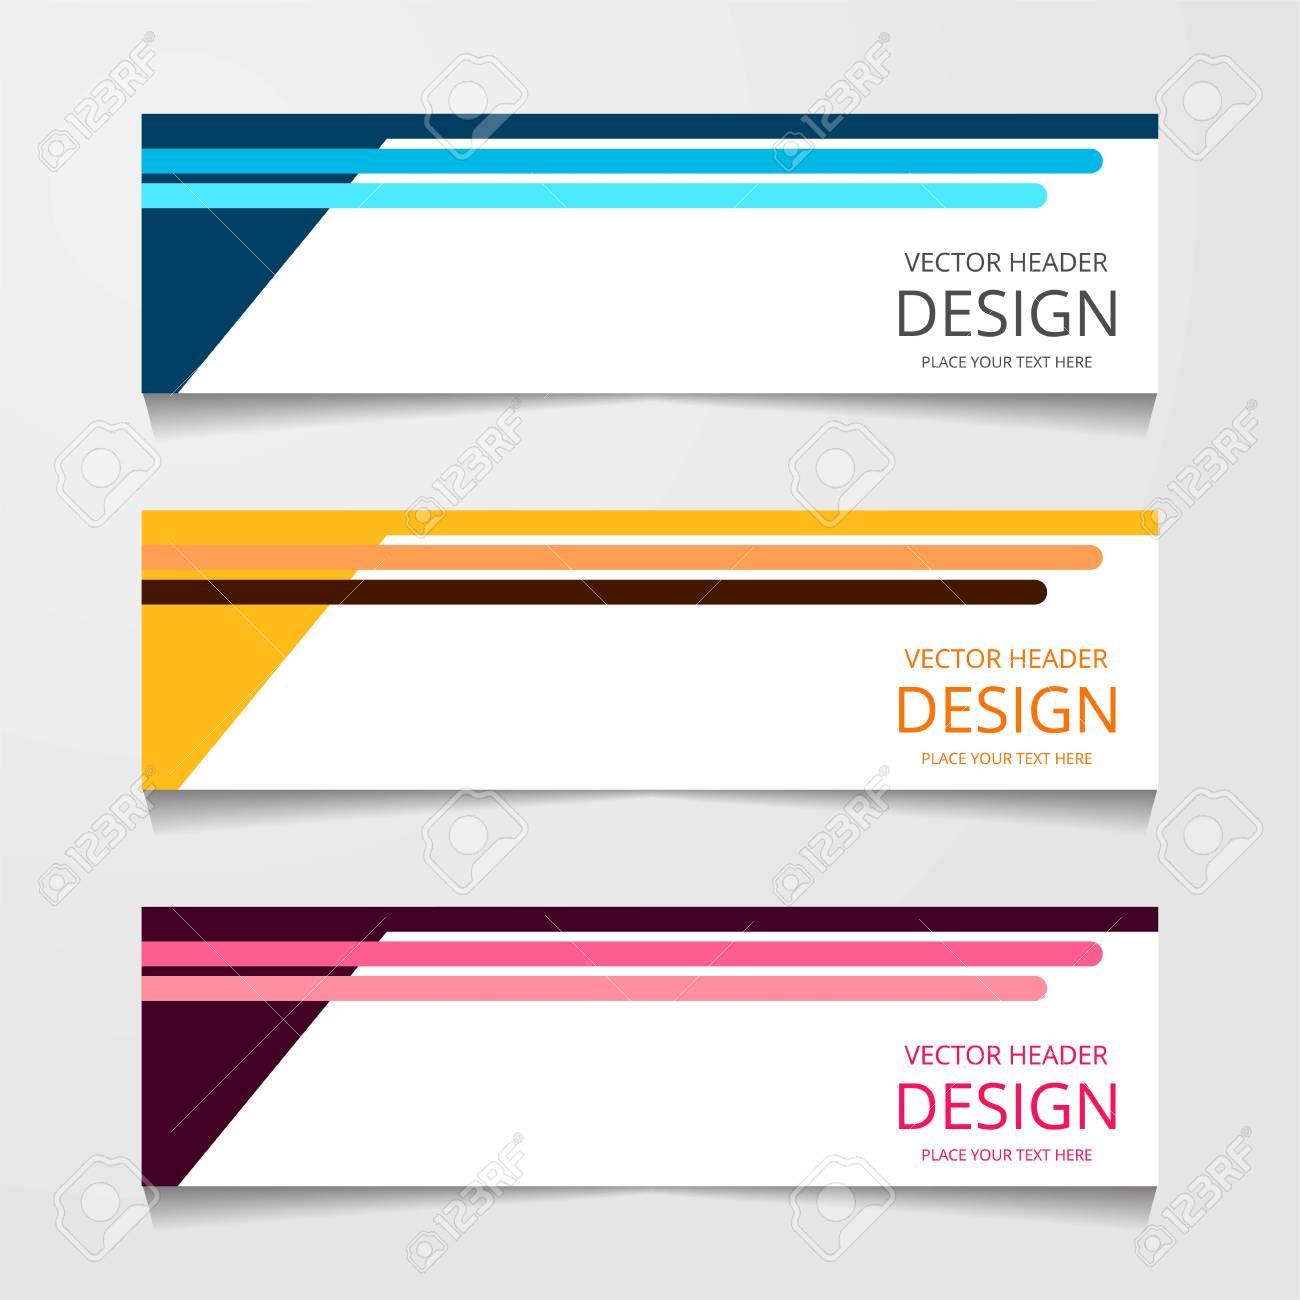 Graphic Design Courses Milton Keynes Blue Sky Online Graphic Design School